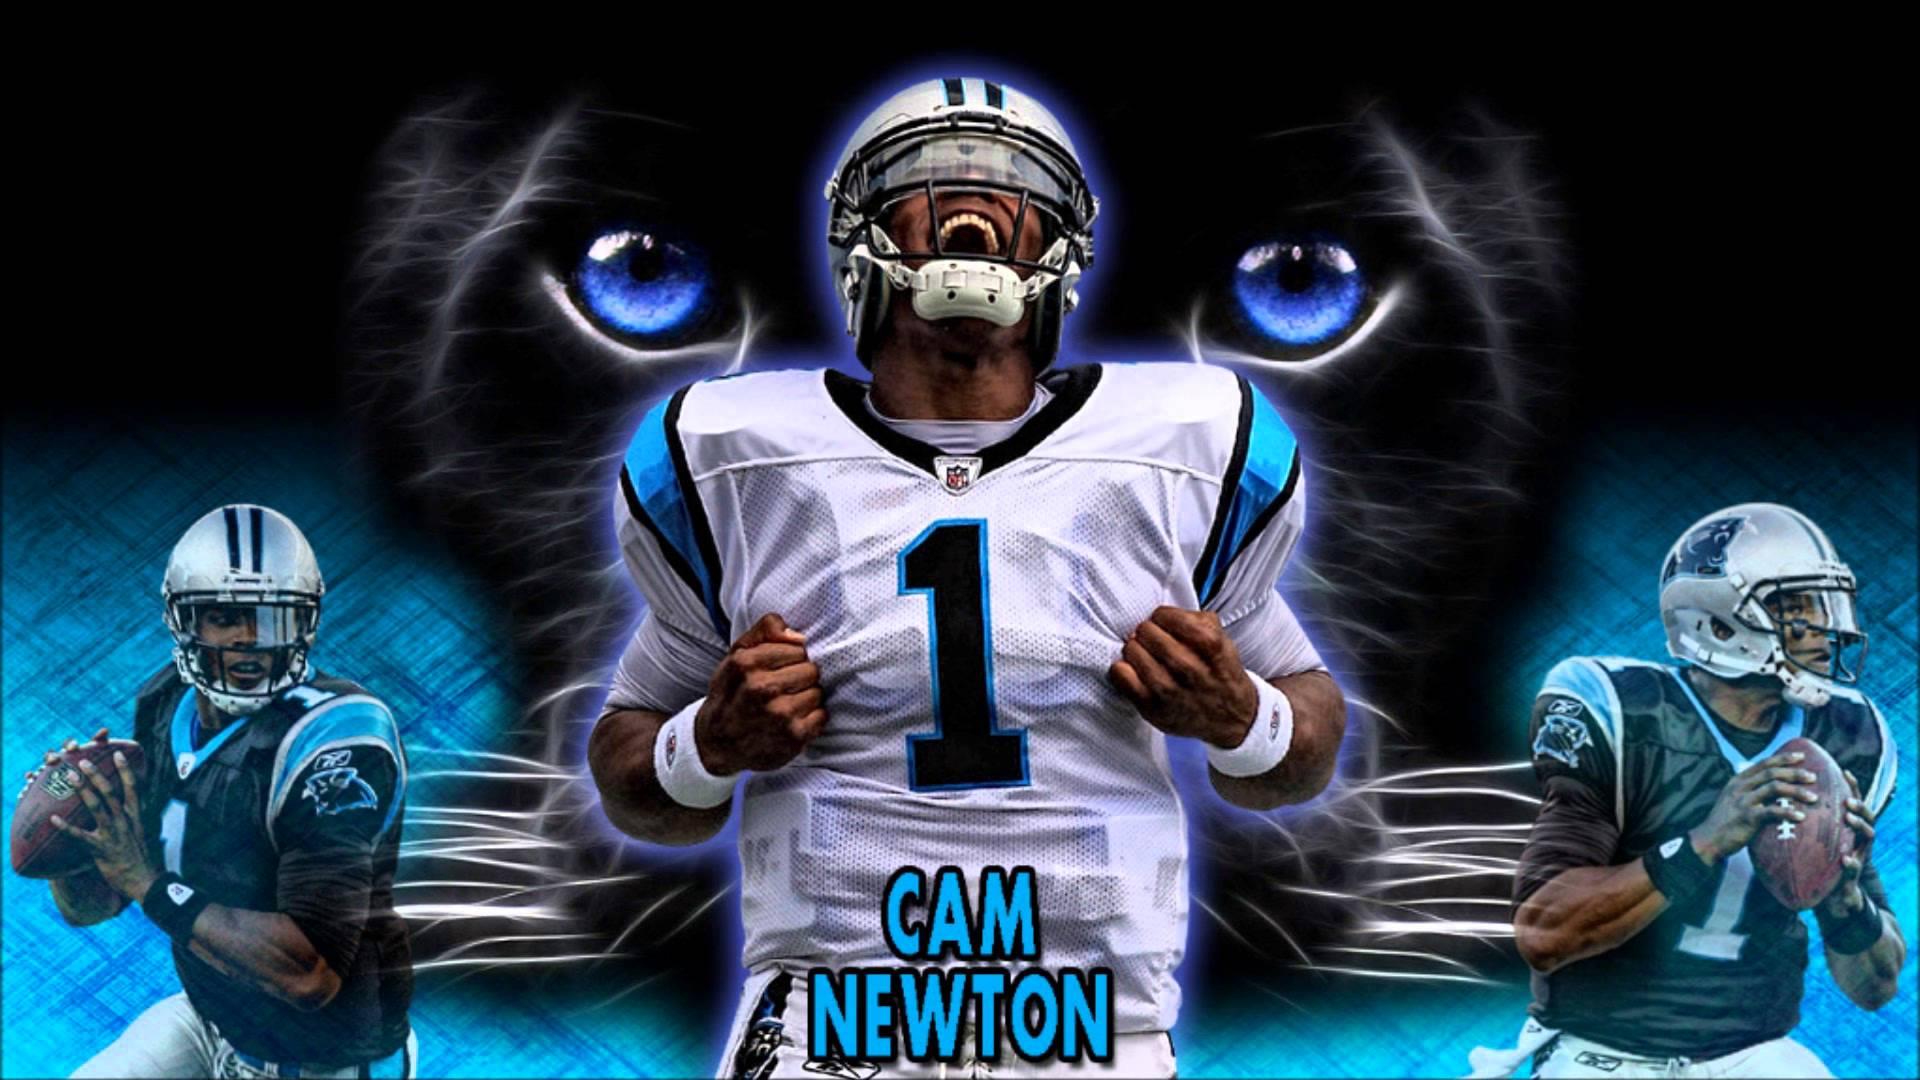 Cam Newton Wallpaper Superman nfl cam newton wallpaper 1920x1080